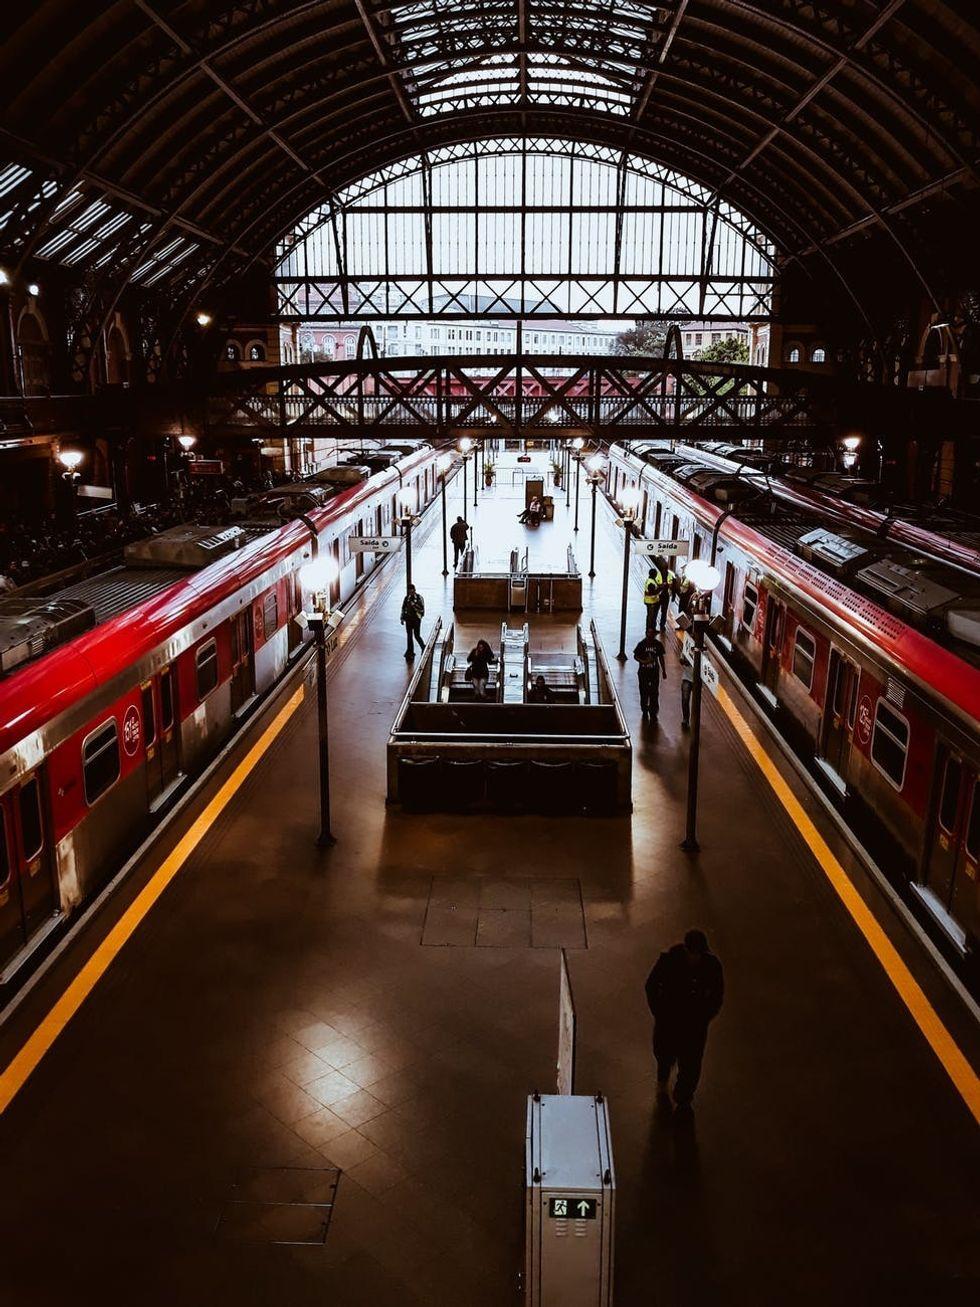 https://www.pexels.com/photo/photo-of-train-station-1824169/